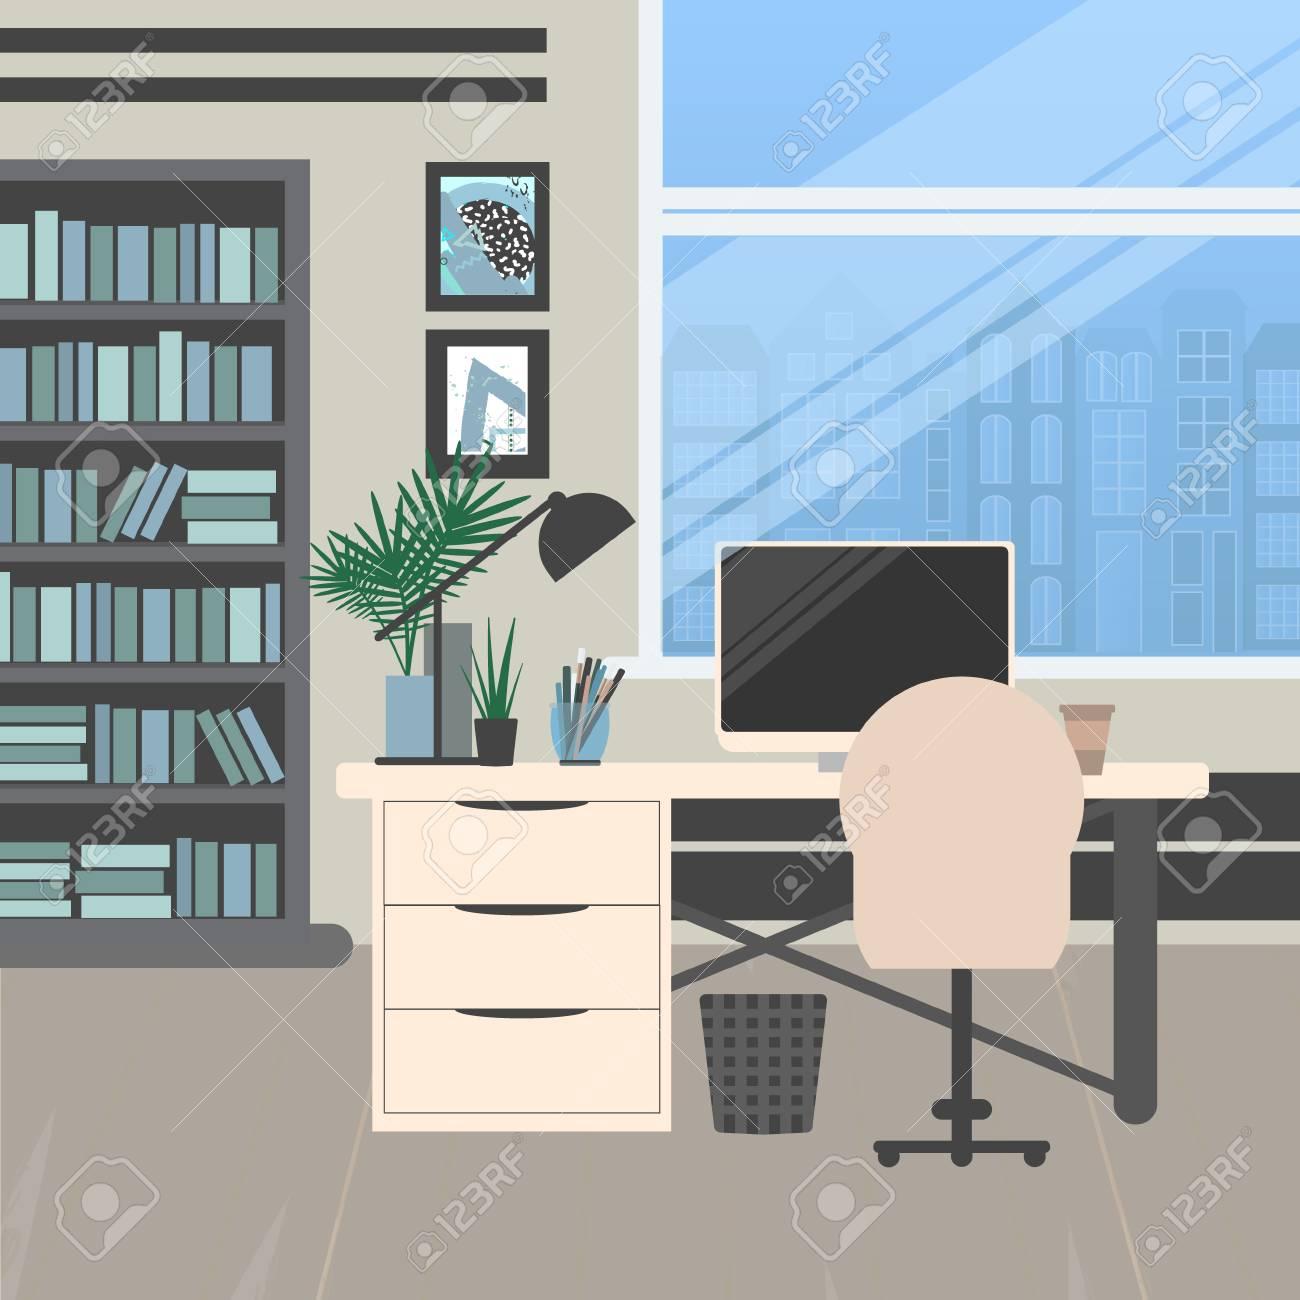 design de bureau moderne. lieu de travail avec grande fenêtre